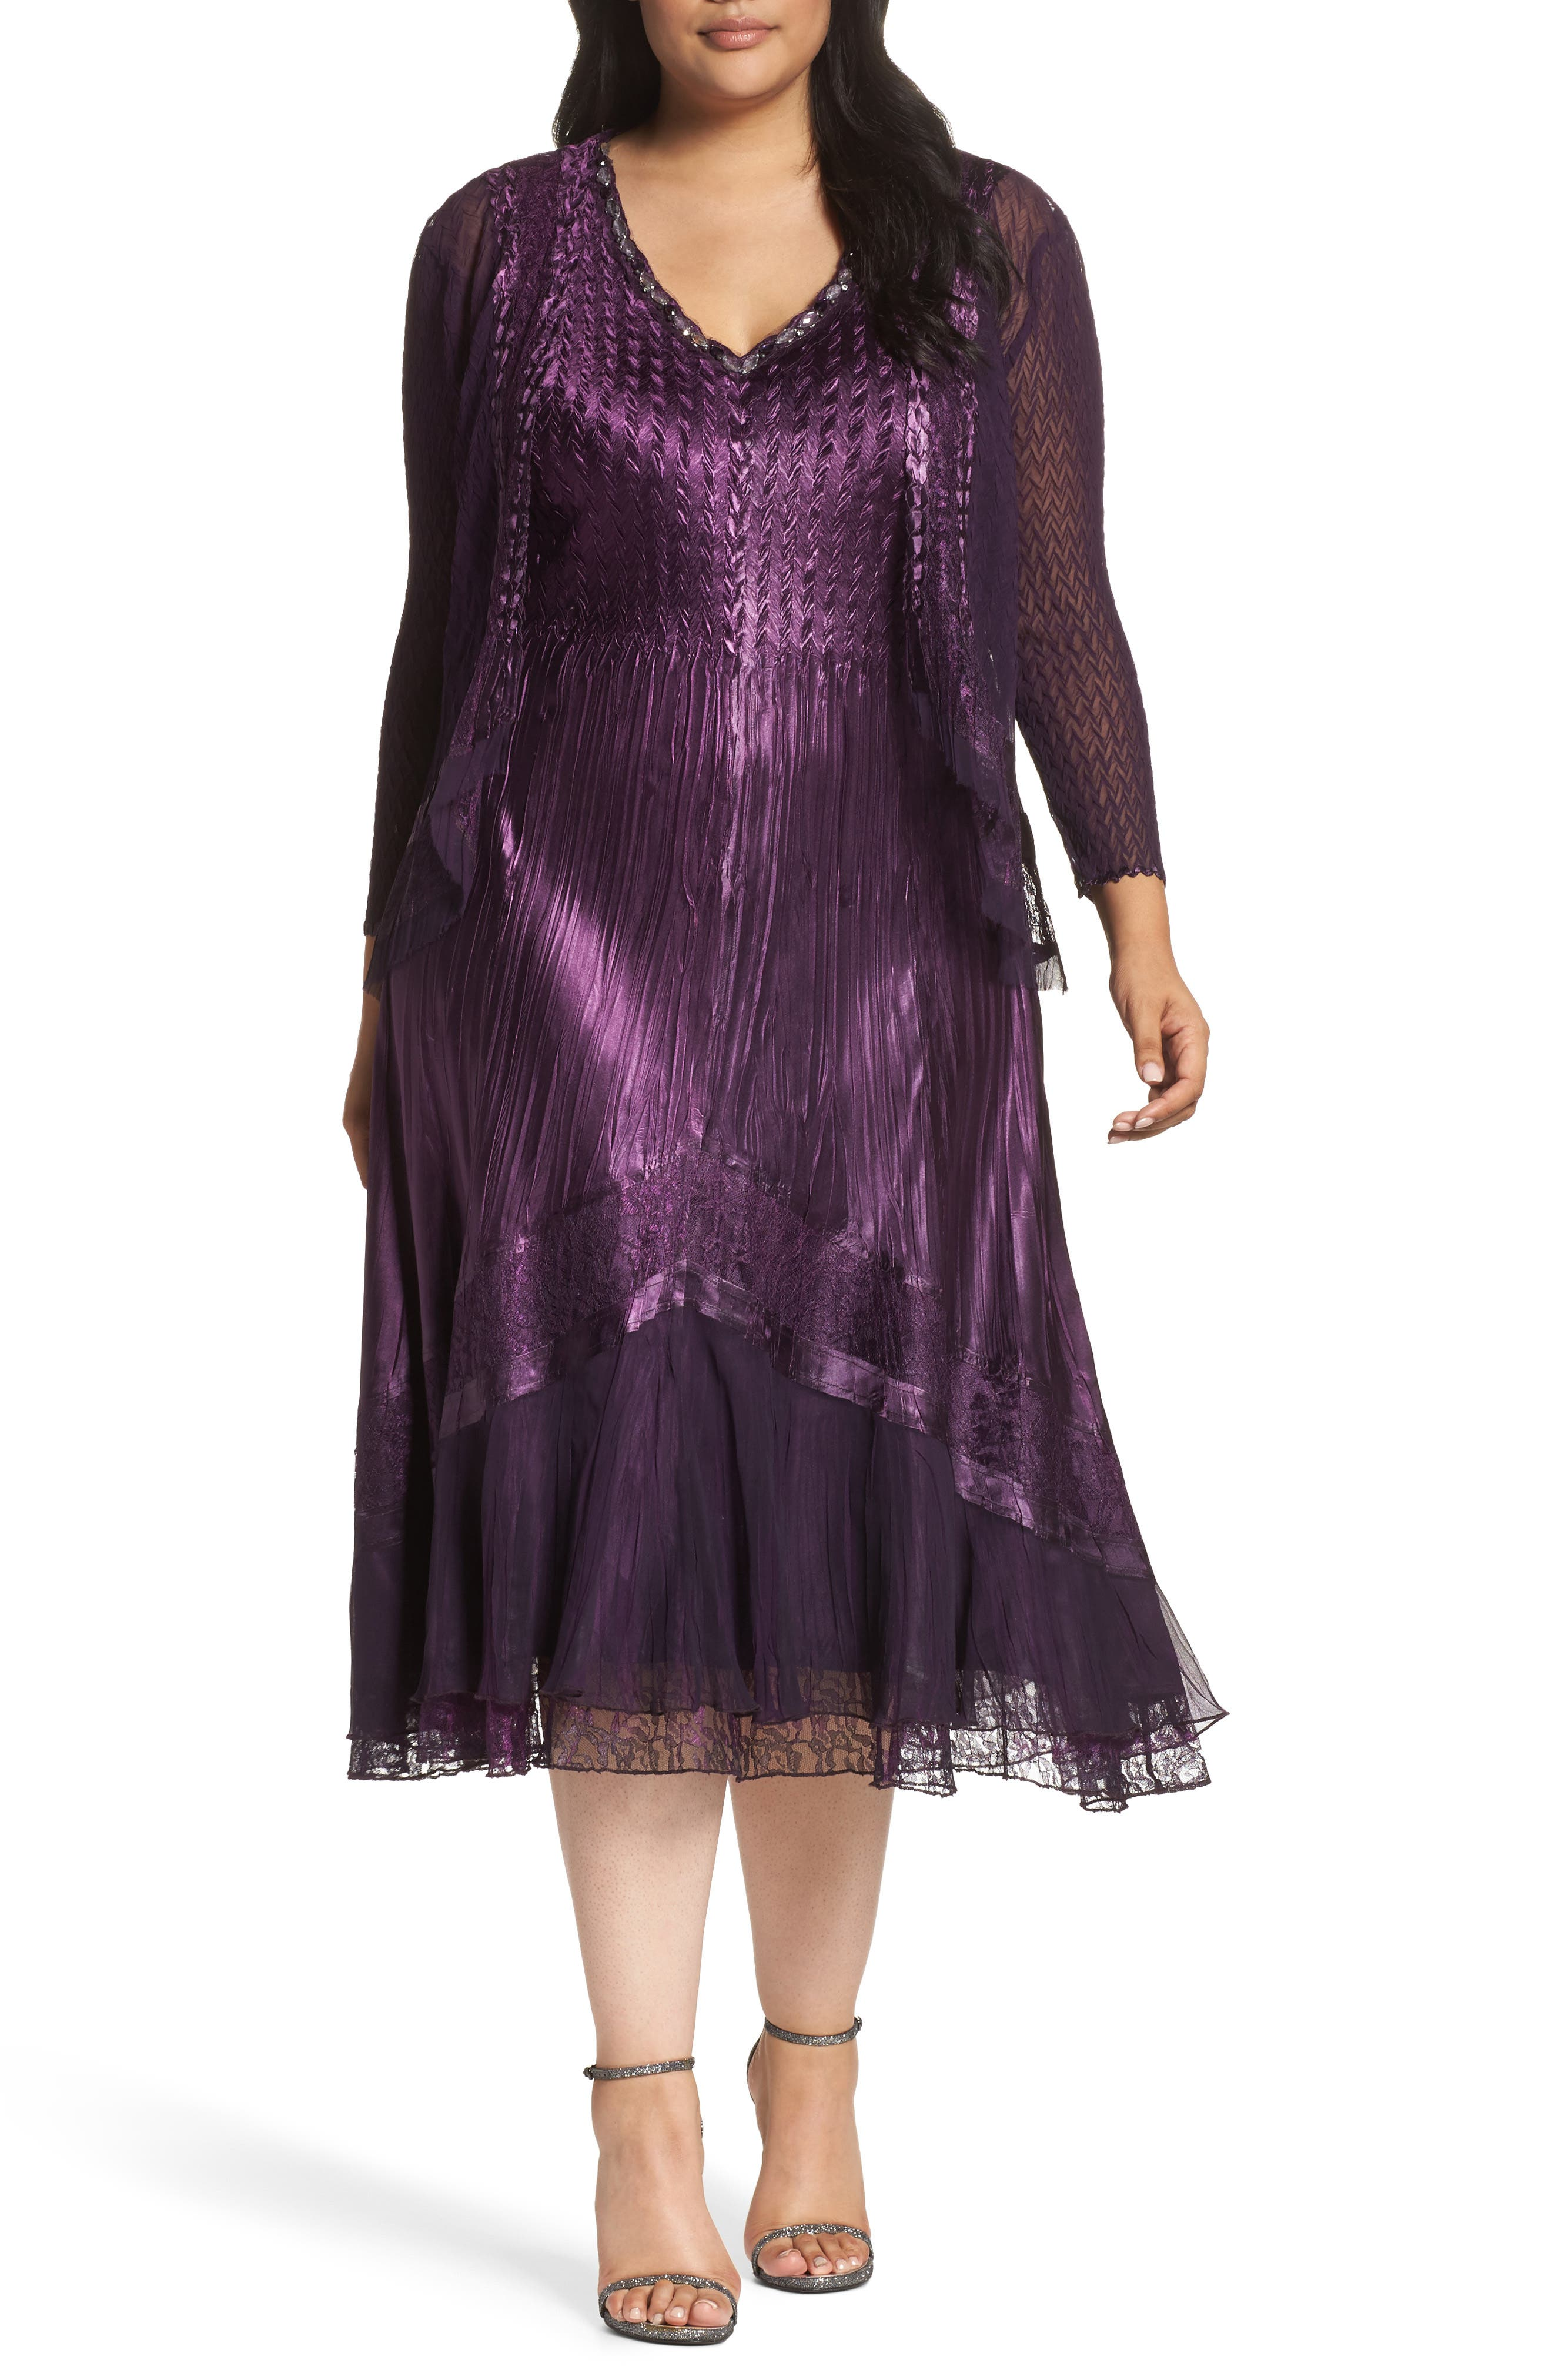 Main Image - Komarov Mixed Media A-Line Dress & Jacket (Plus Size)